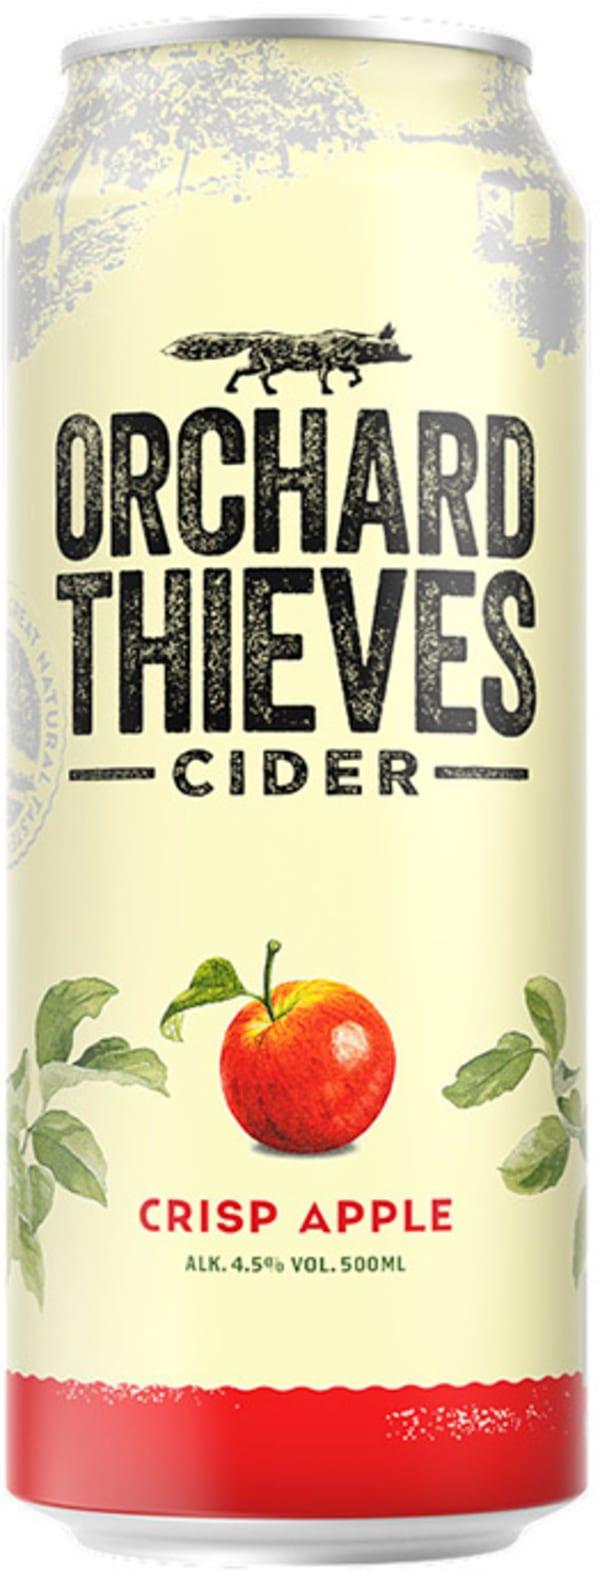 Orchard Thieves Crisp Apple Cider burk